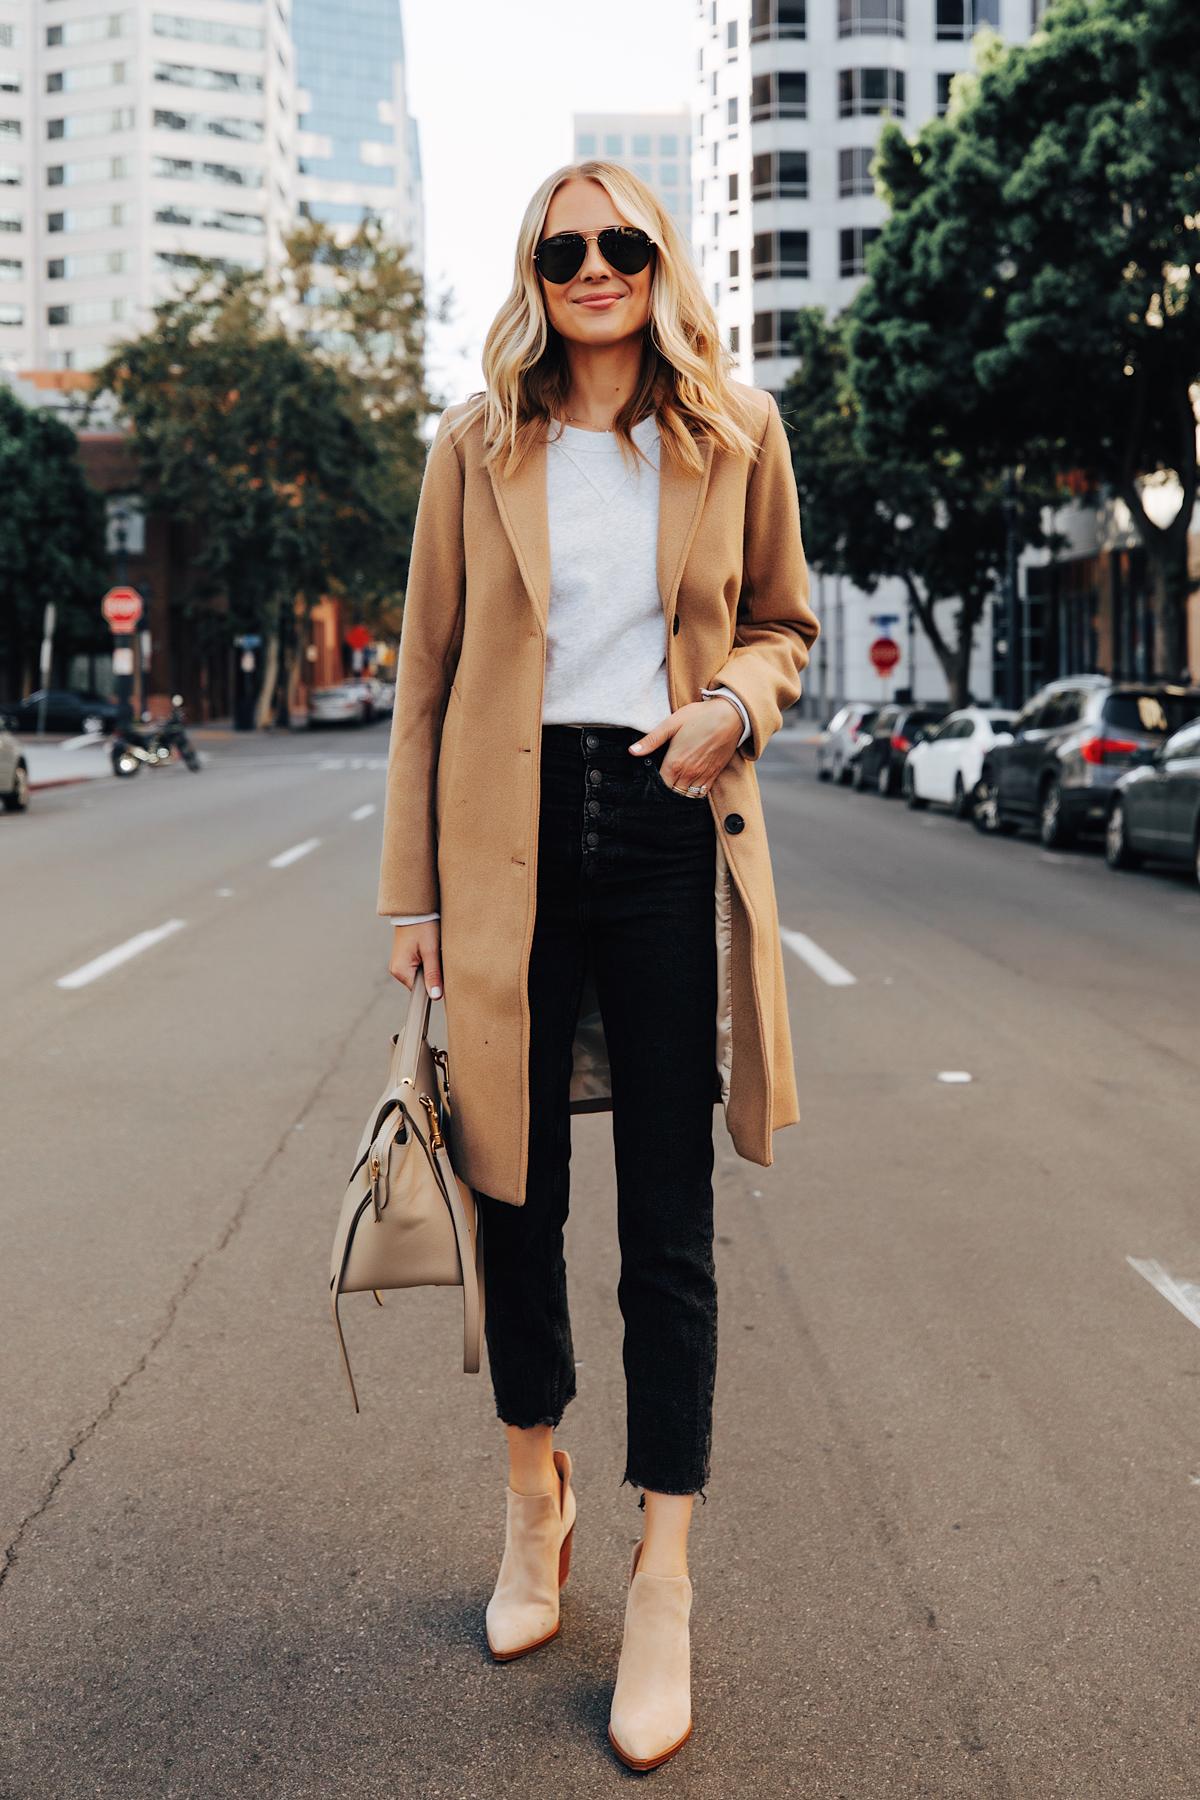 Fashion Jackson Wearing Abercrombie Camel Coat Grey Sweatshirt Black Raw Hem Jeans Tan Suede Booties Fall Outfit